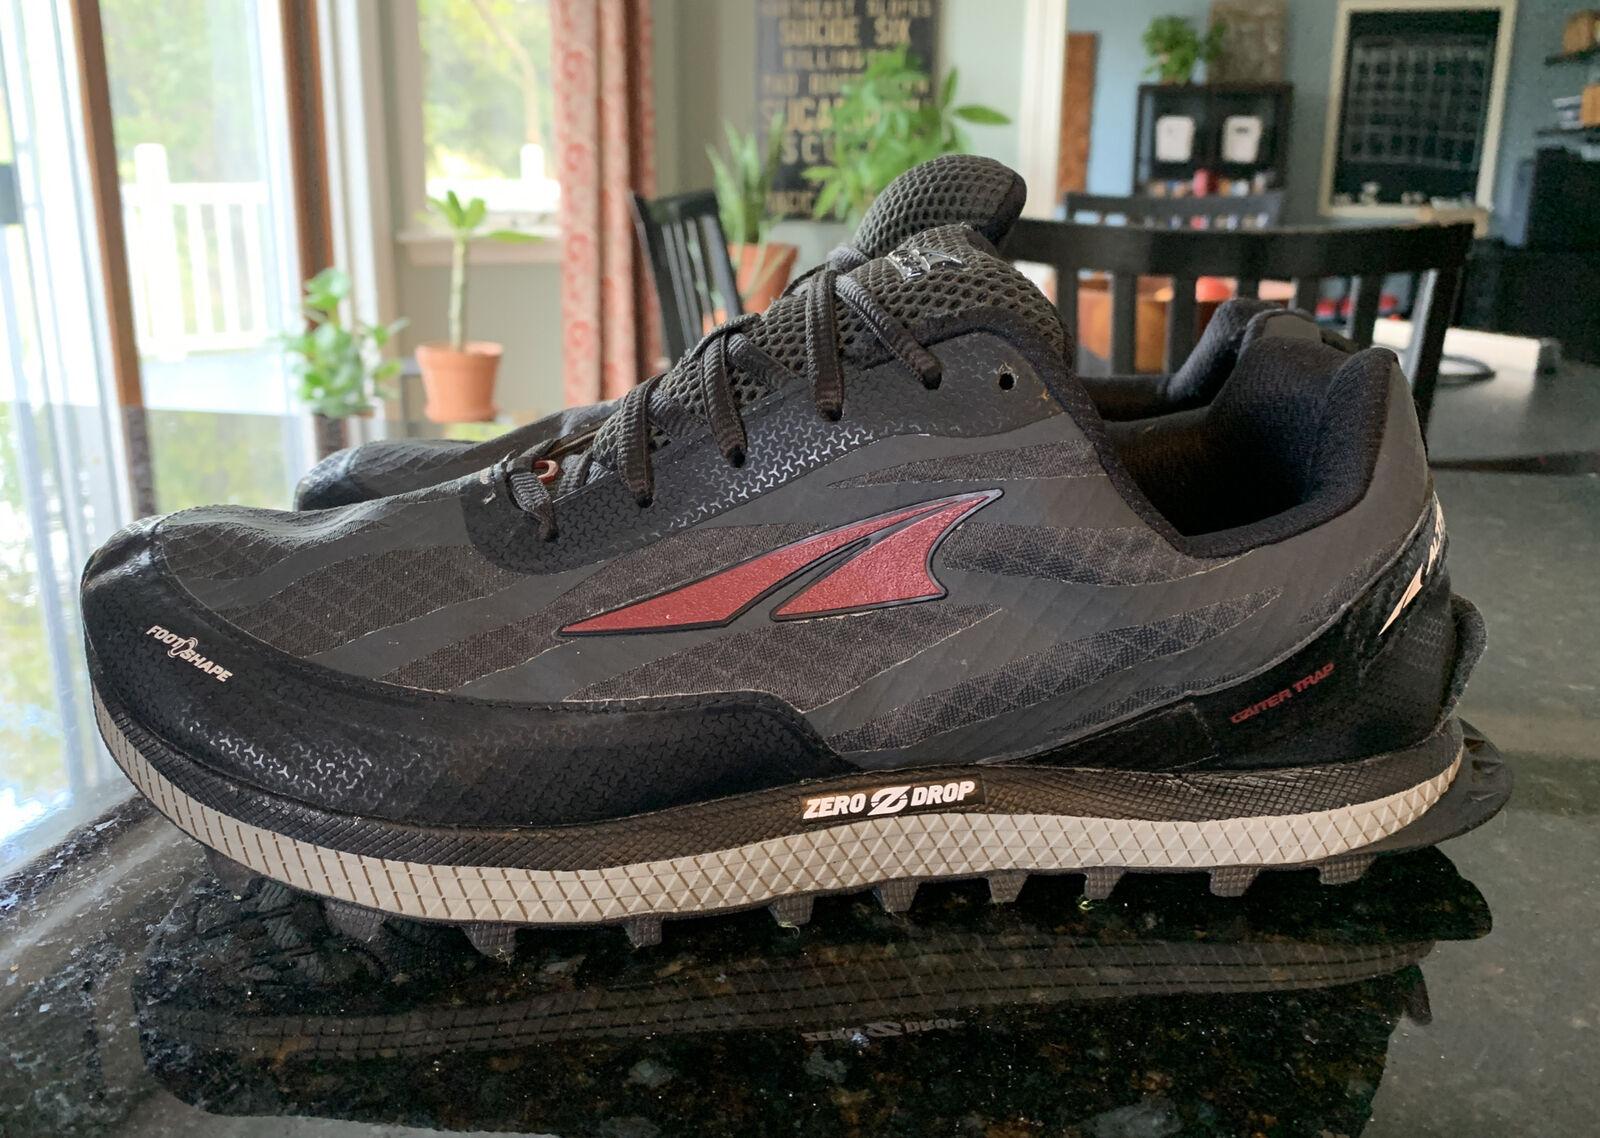 zero drop running shoes uk